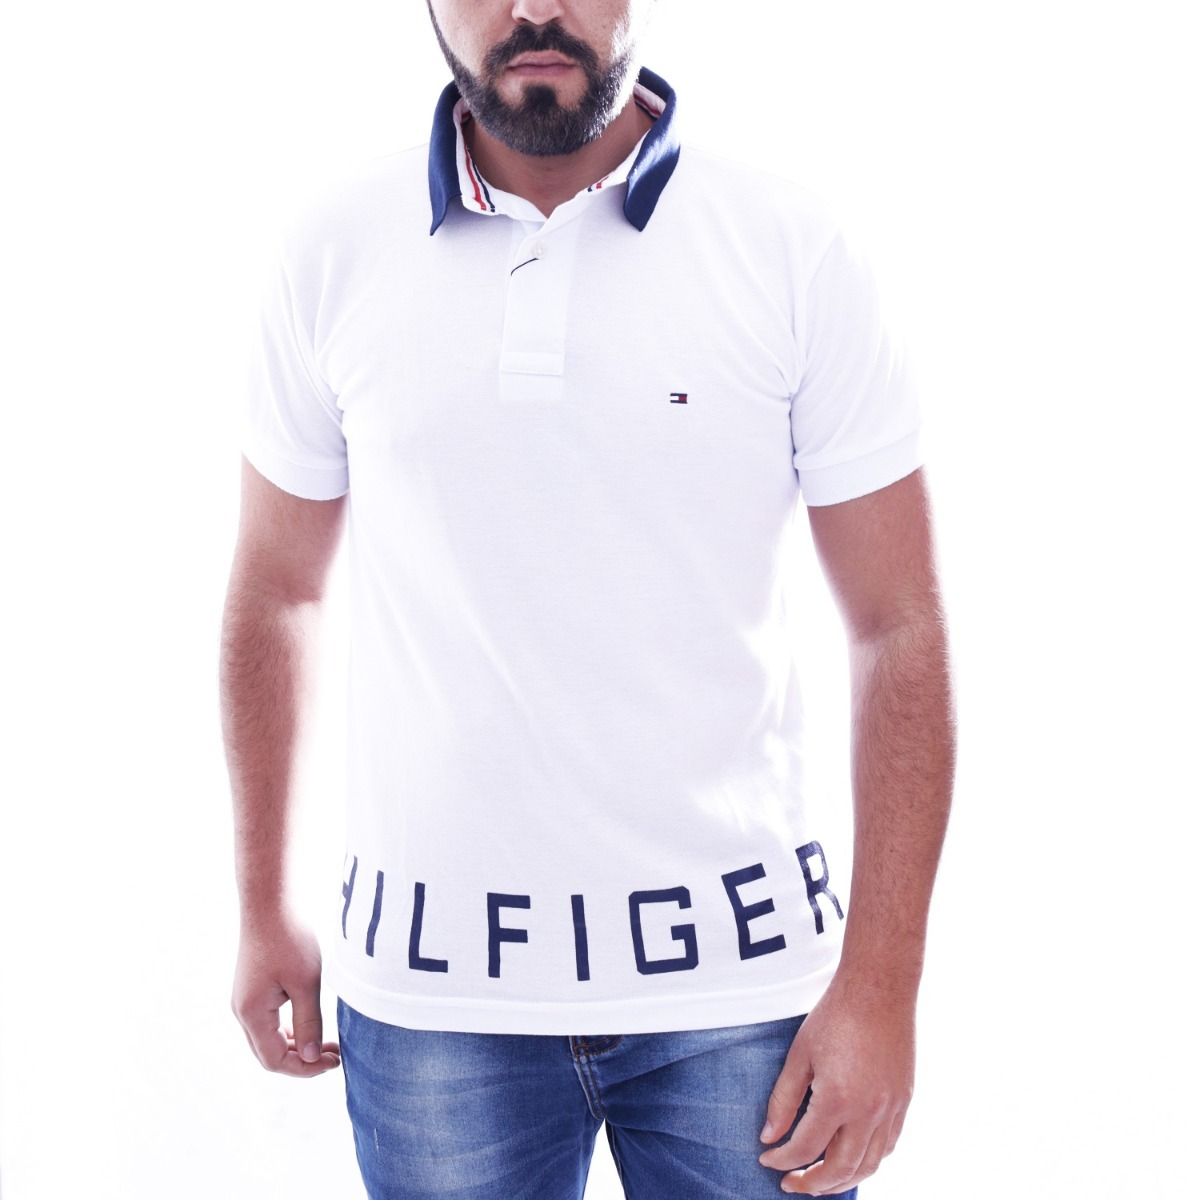 211eed981 Kit 2 Camisetas Lacoste + 1 Polo Tommy Hilfiger - R$ 280,00 em ...